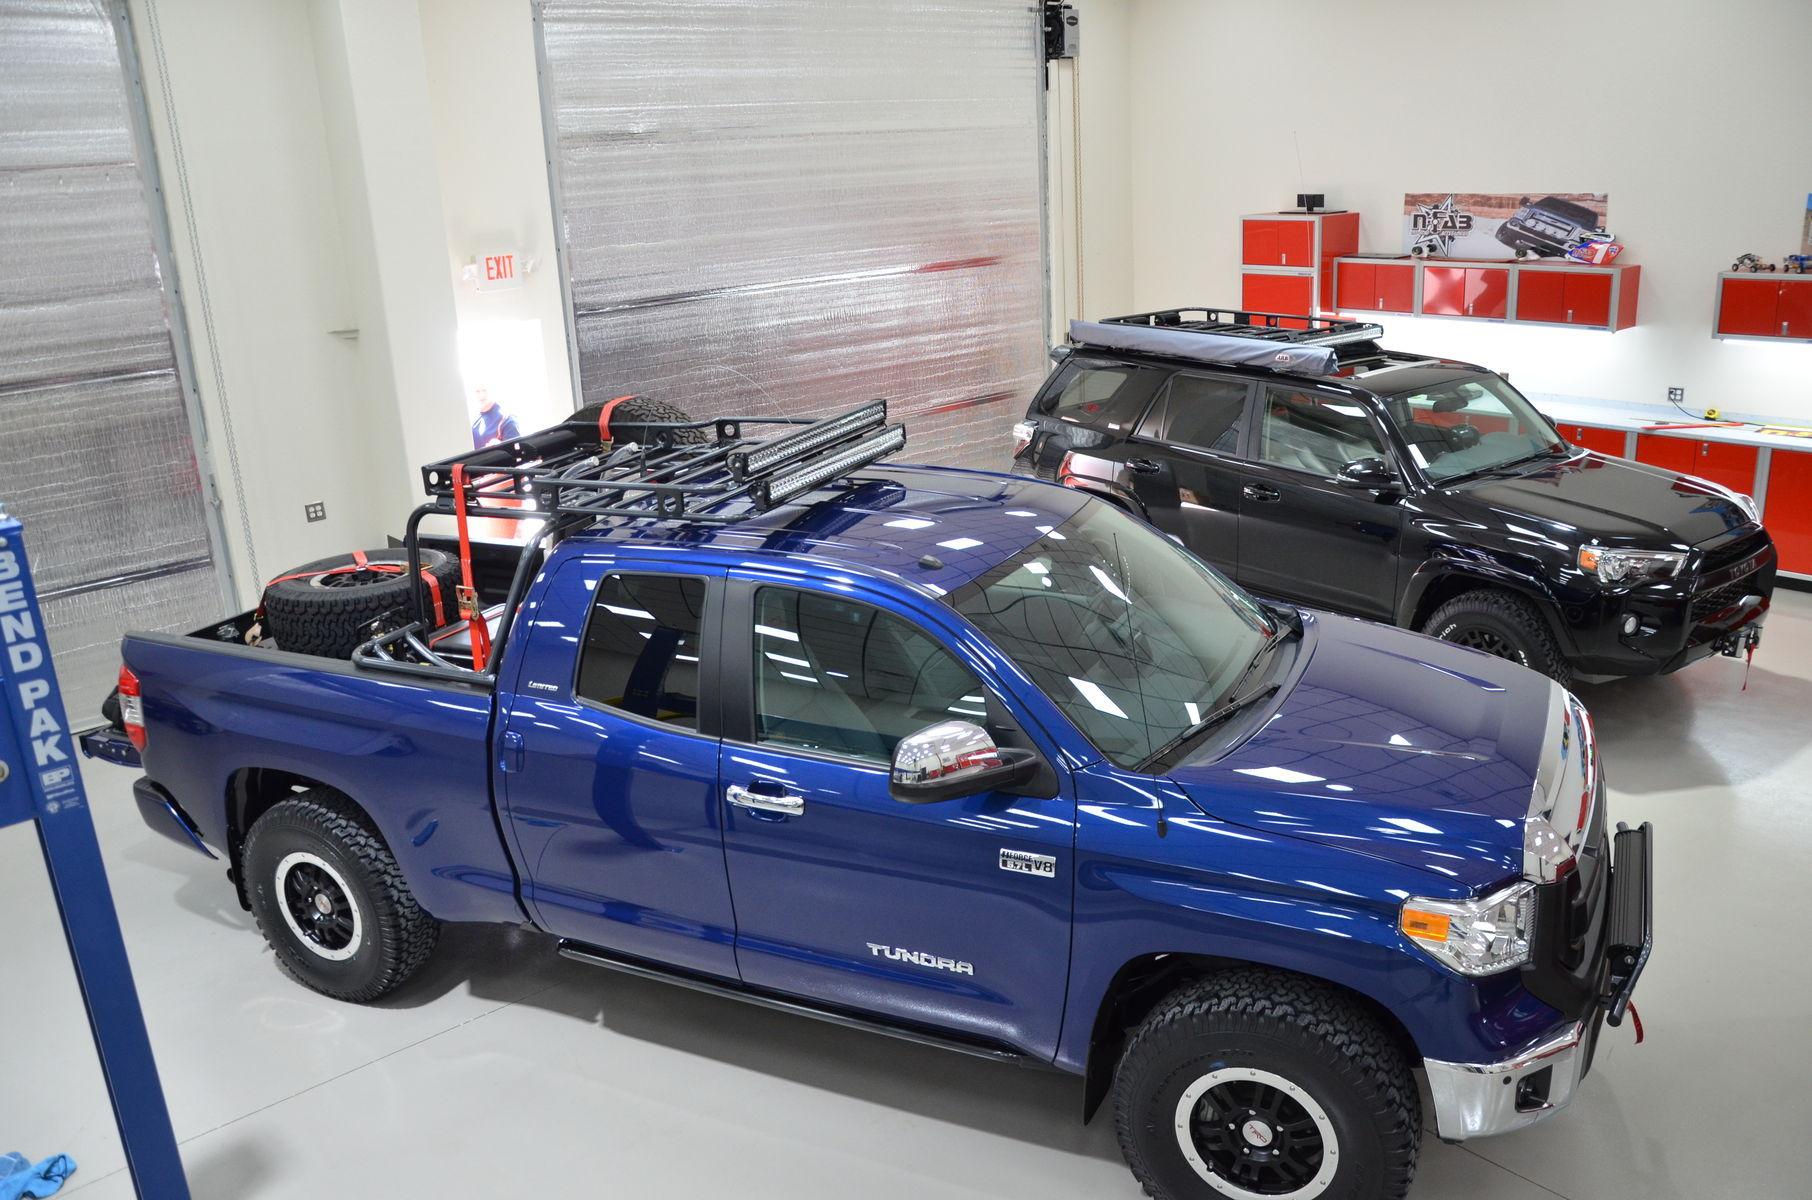 2014 Toyota Tundra | N-FAB TRD PRO Build - Toyota Tundra Teammates